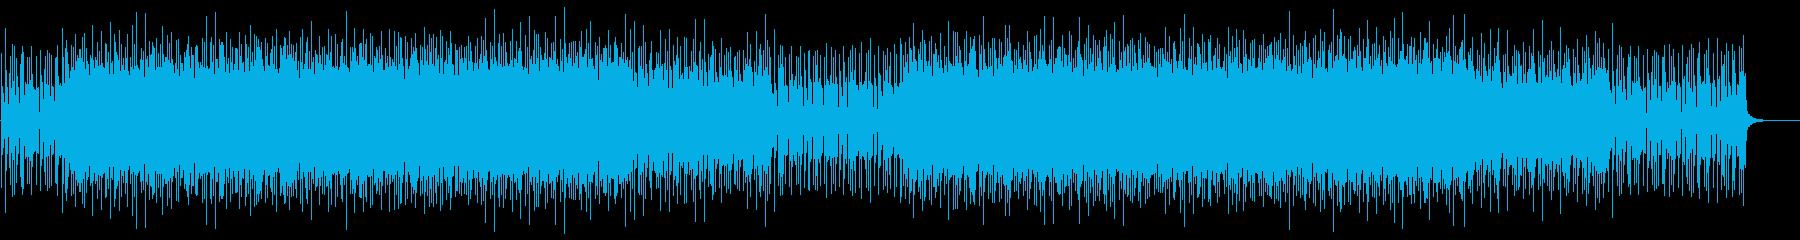 CMに 透明感ある爽やかなポップロックの再生済みの波形